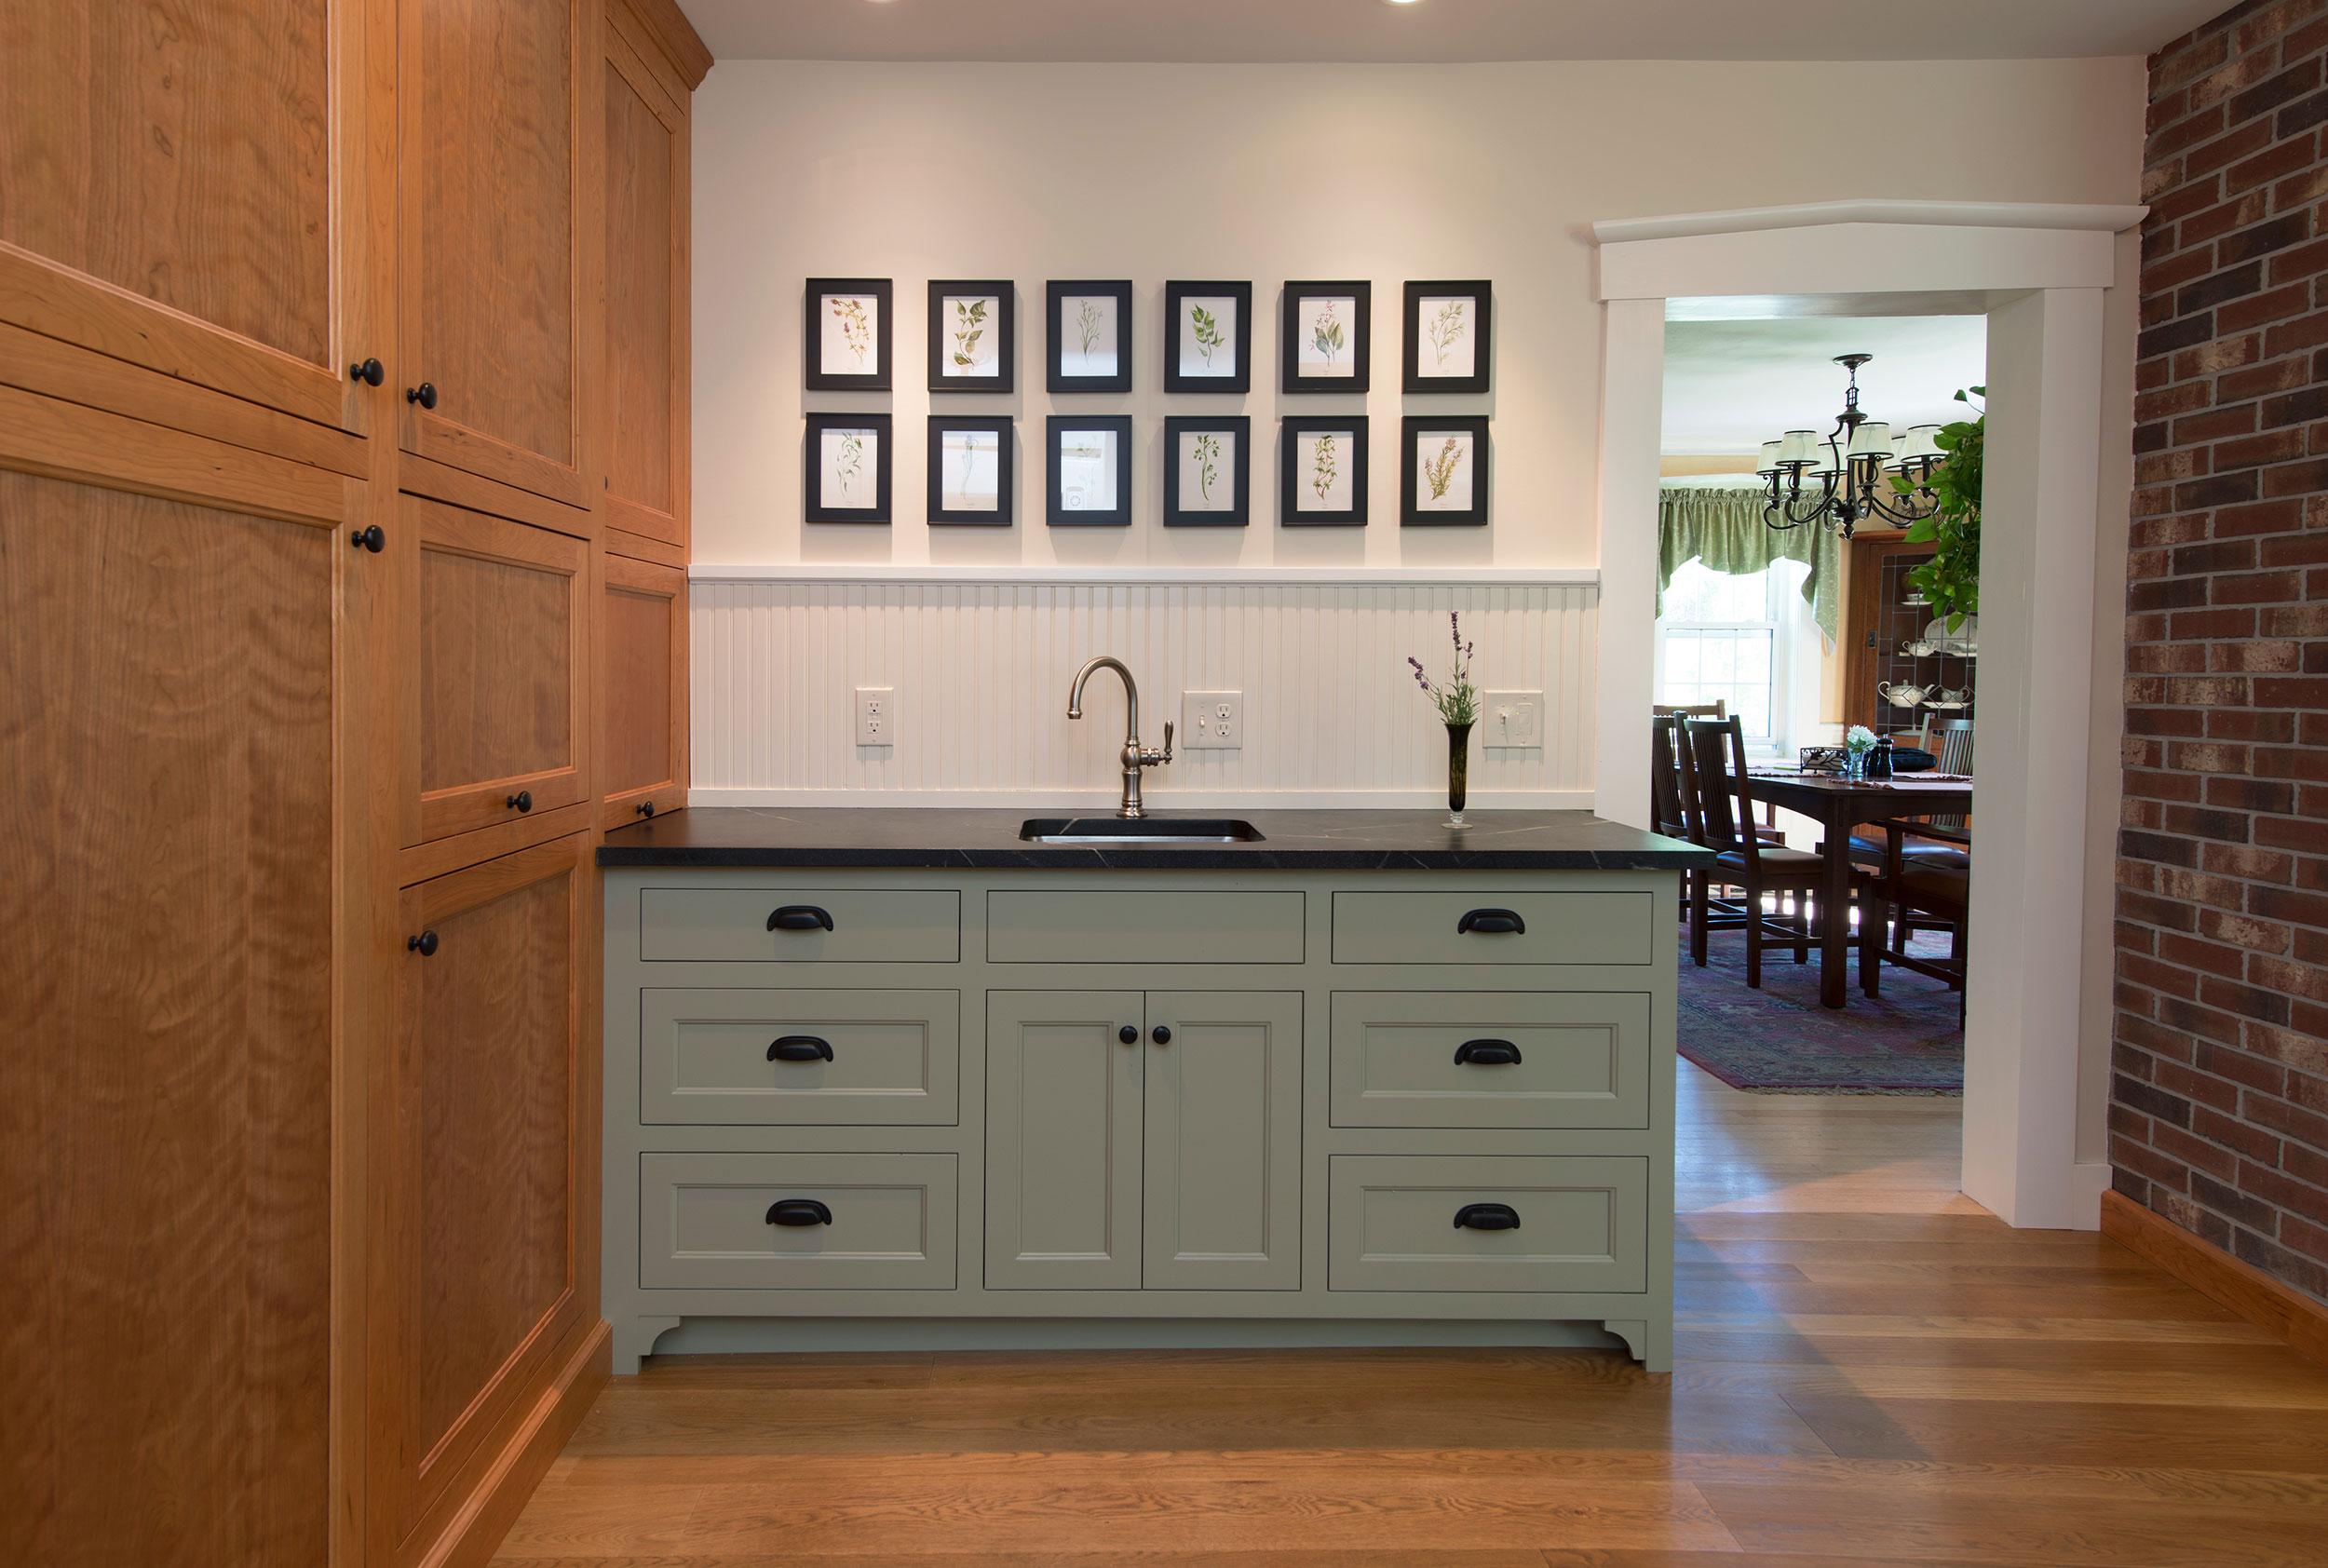 Vanity-in-historic-new-hampshire-home_DSC0085.jpg